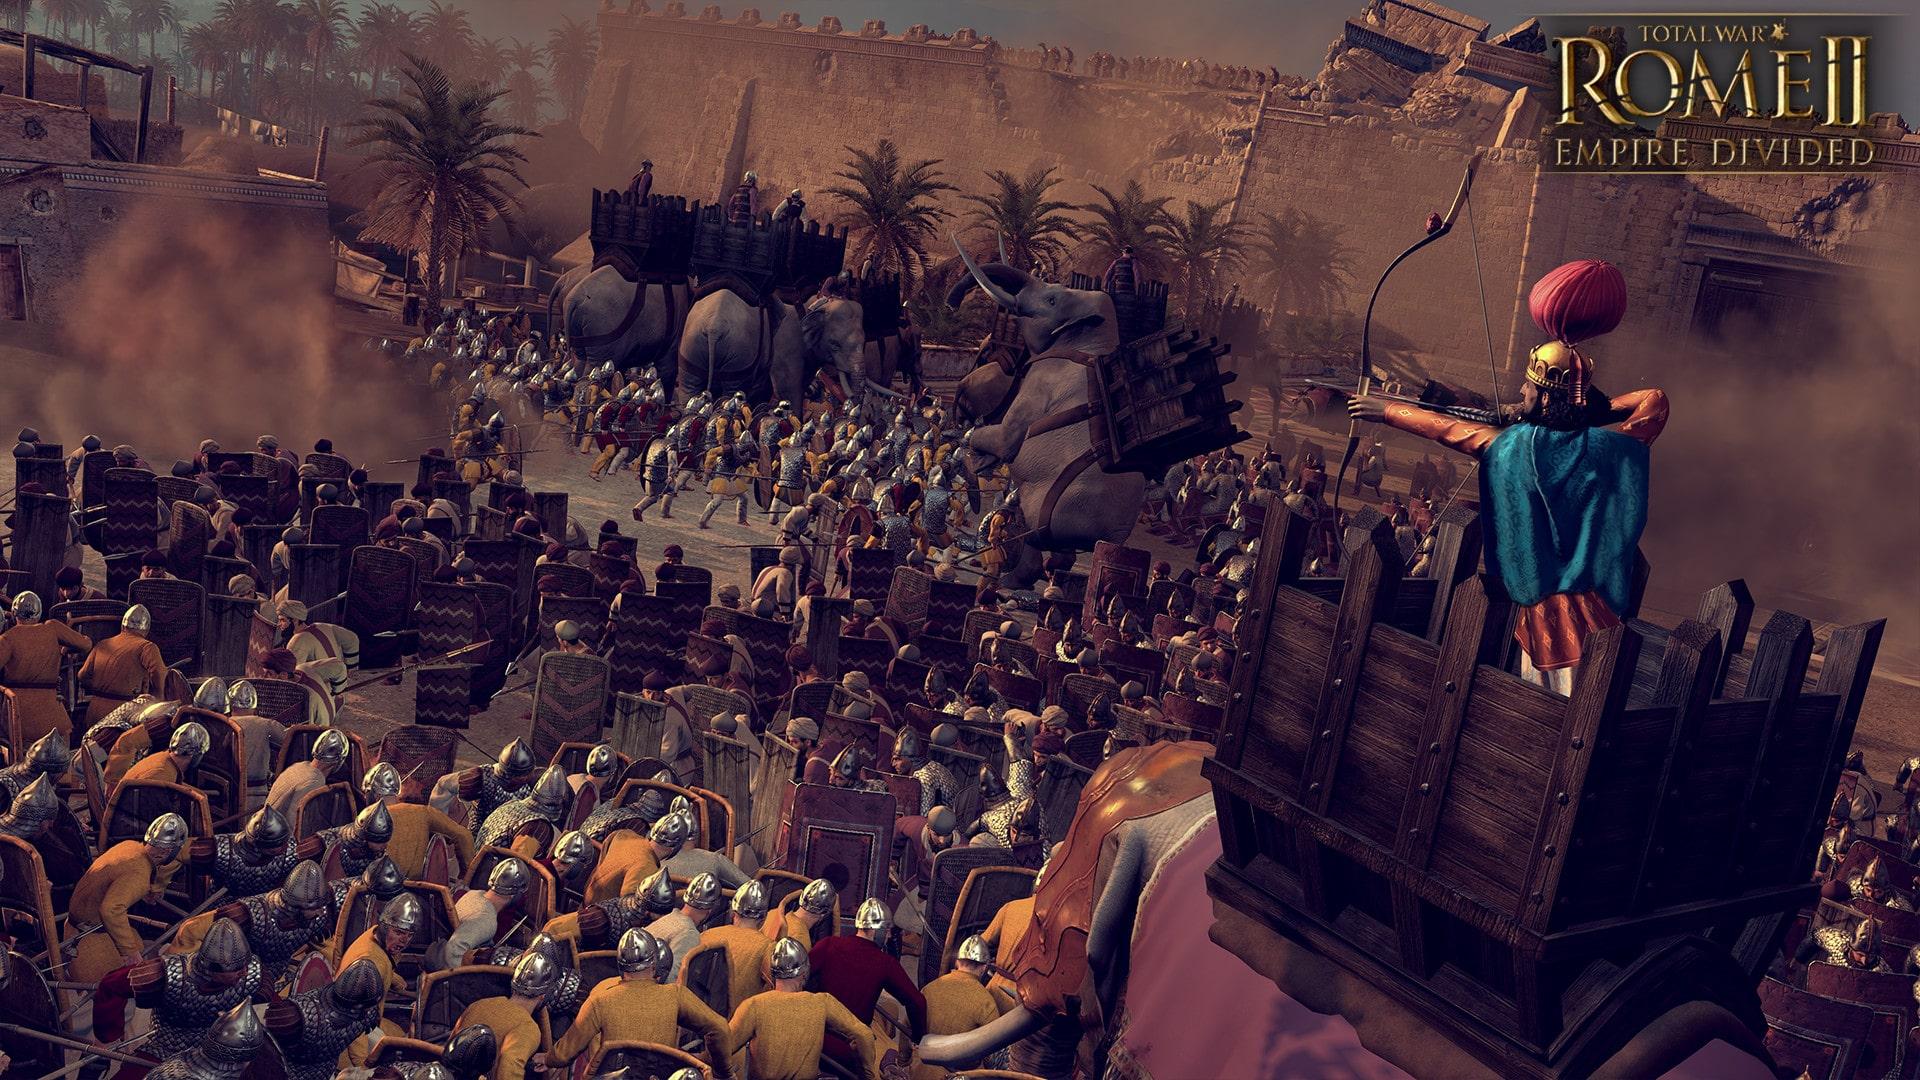 Total War Rome II Free Download Full Version Here Download Link...See more of Total War Rome 2 Pc Game Free Download on Facebook.